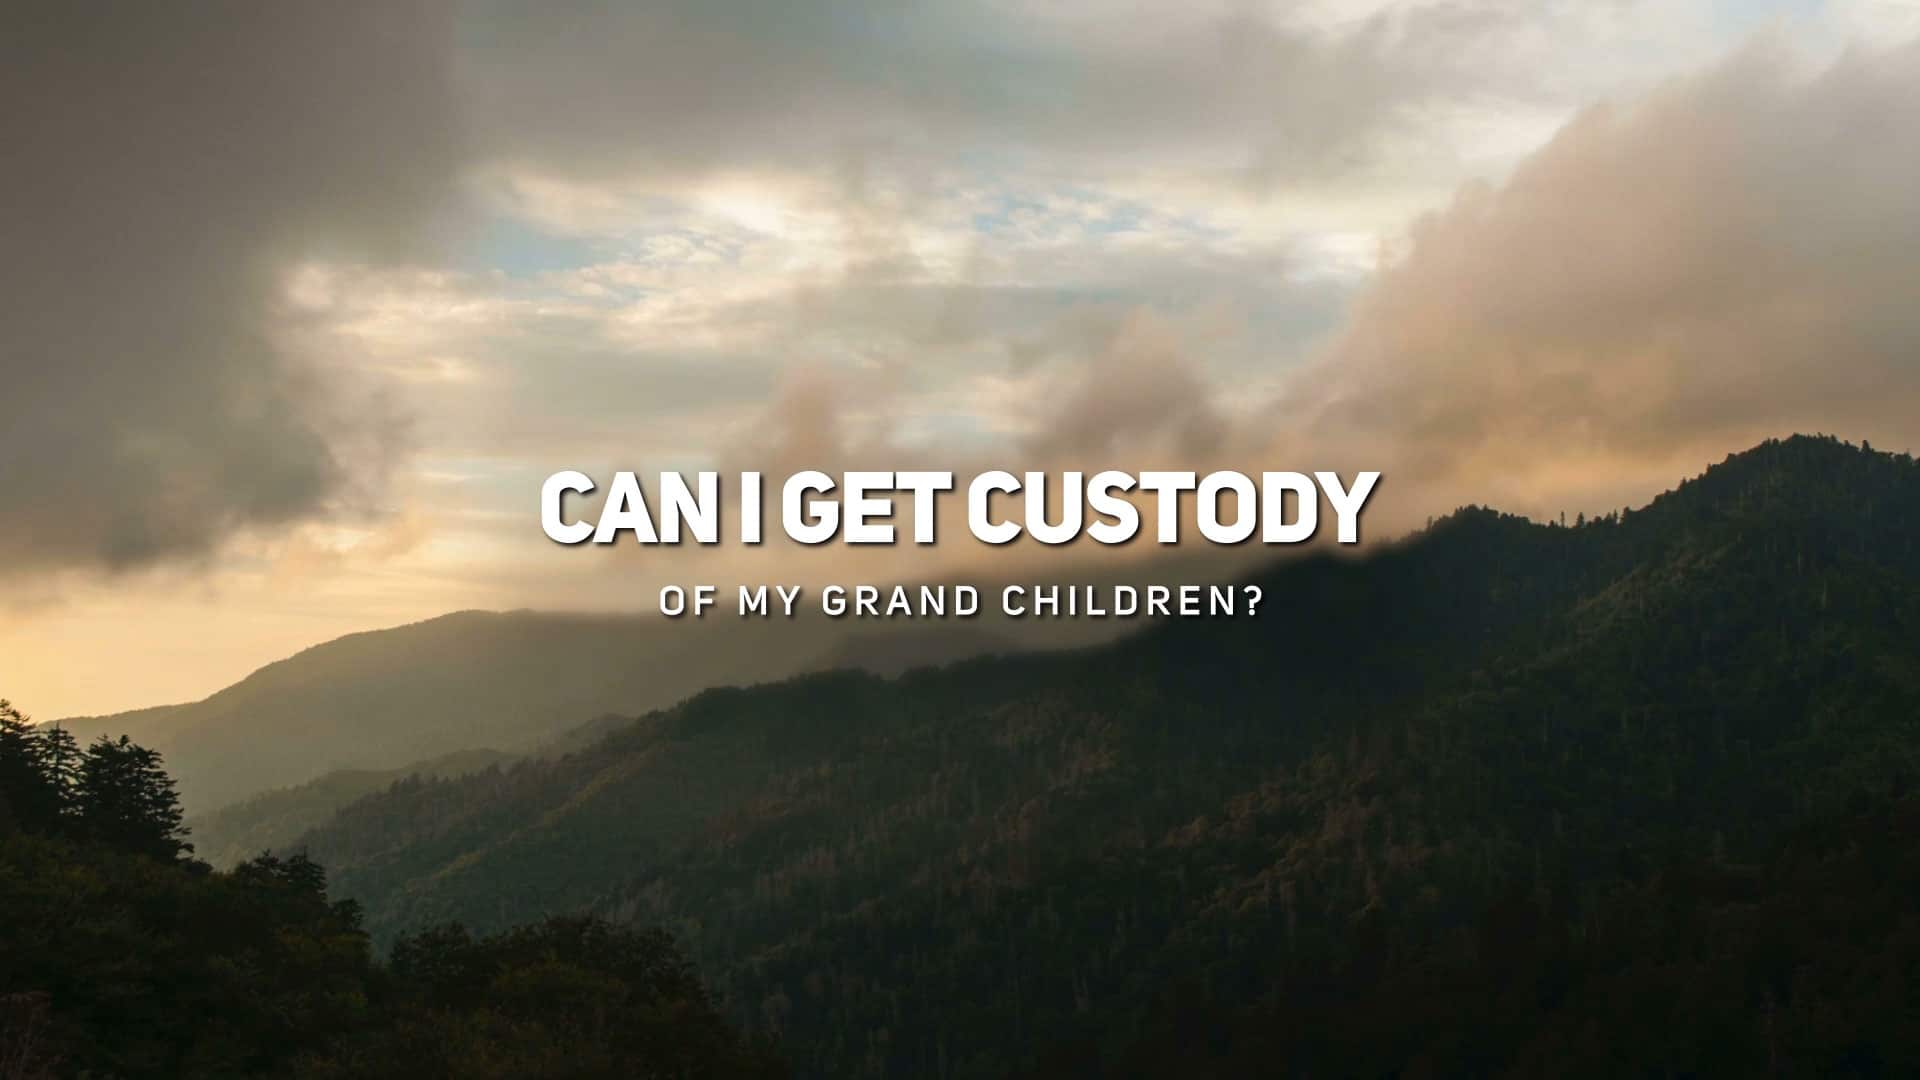 Can I Get Custody of My Grand Children